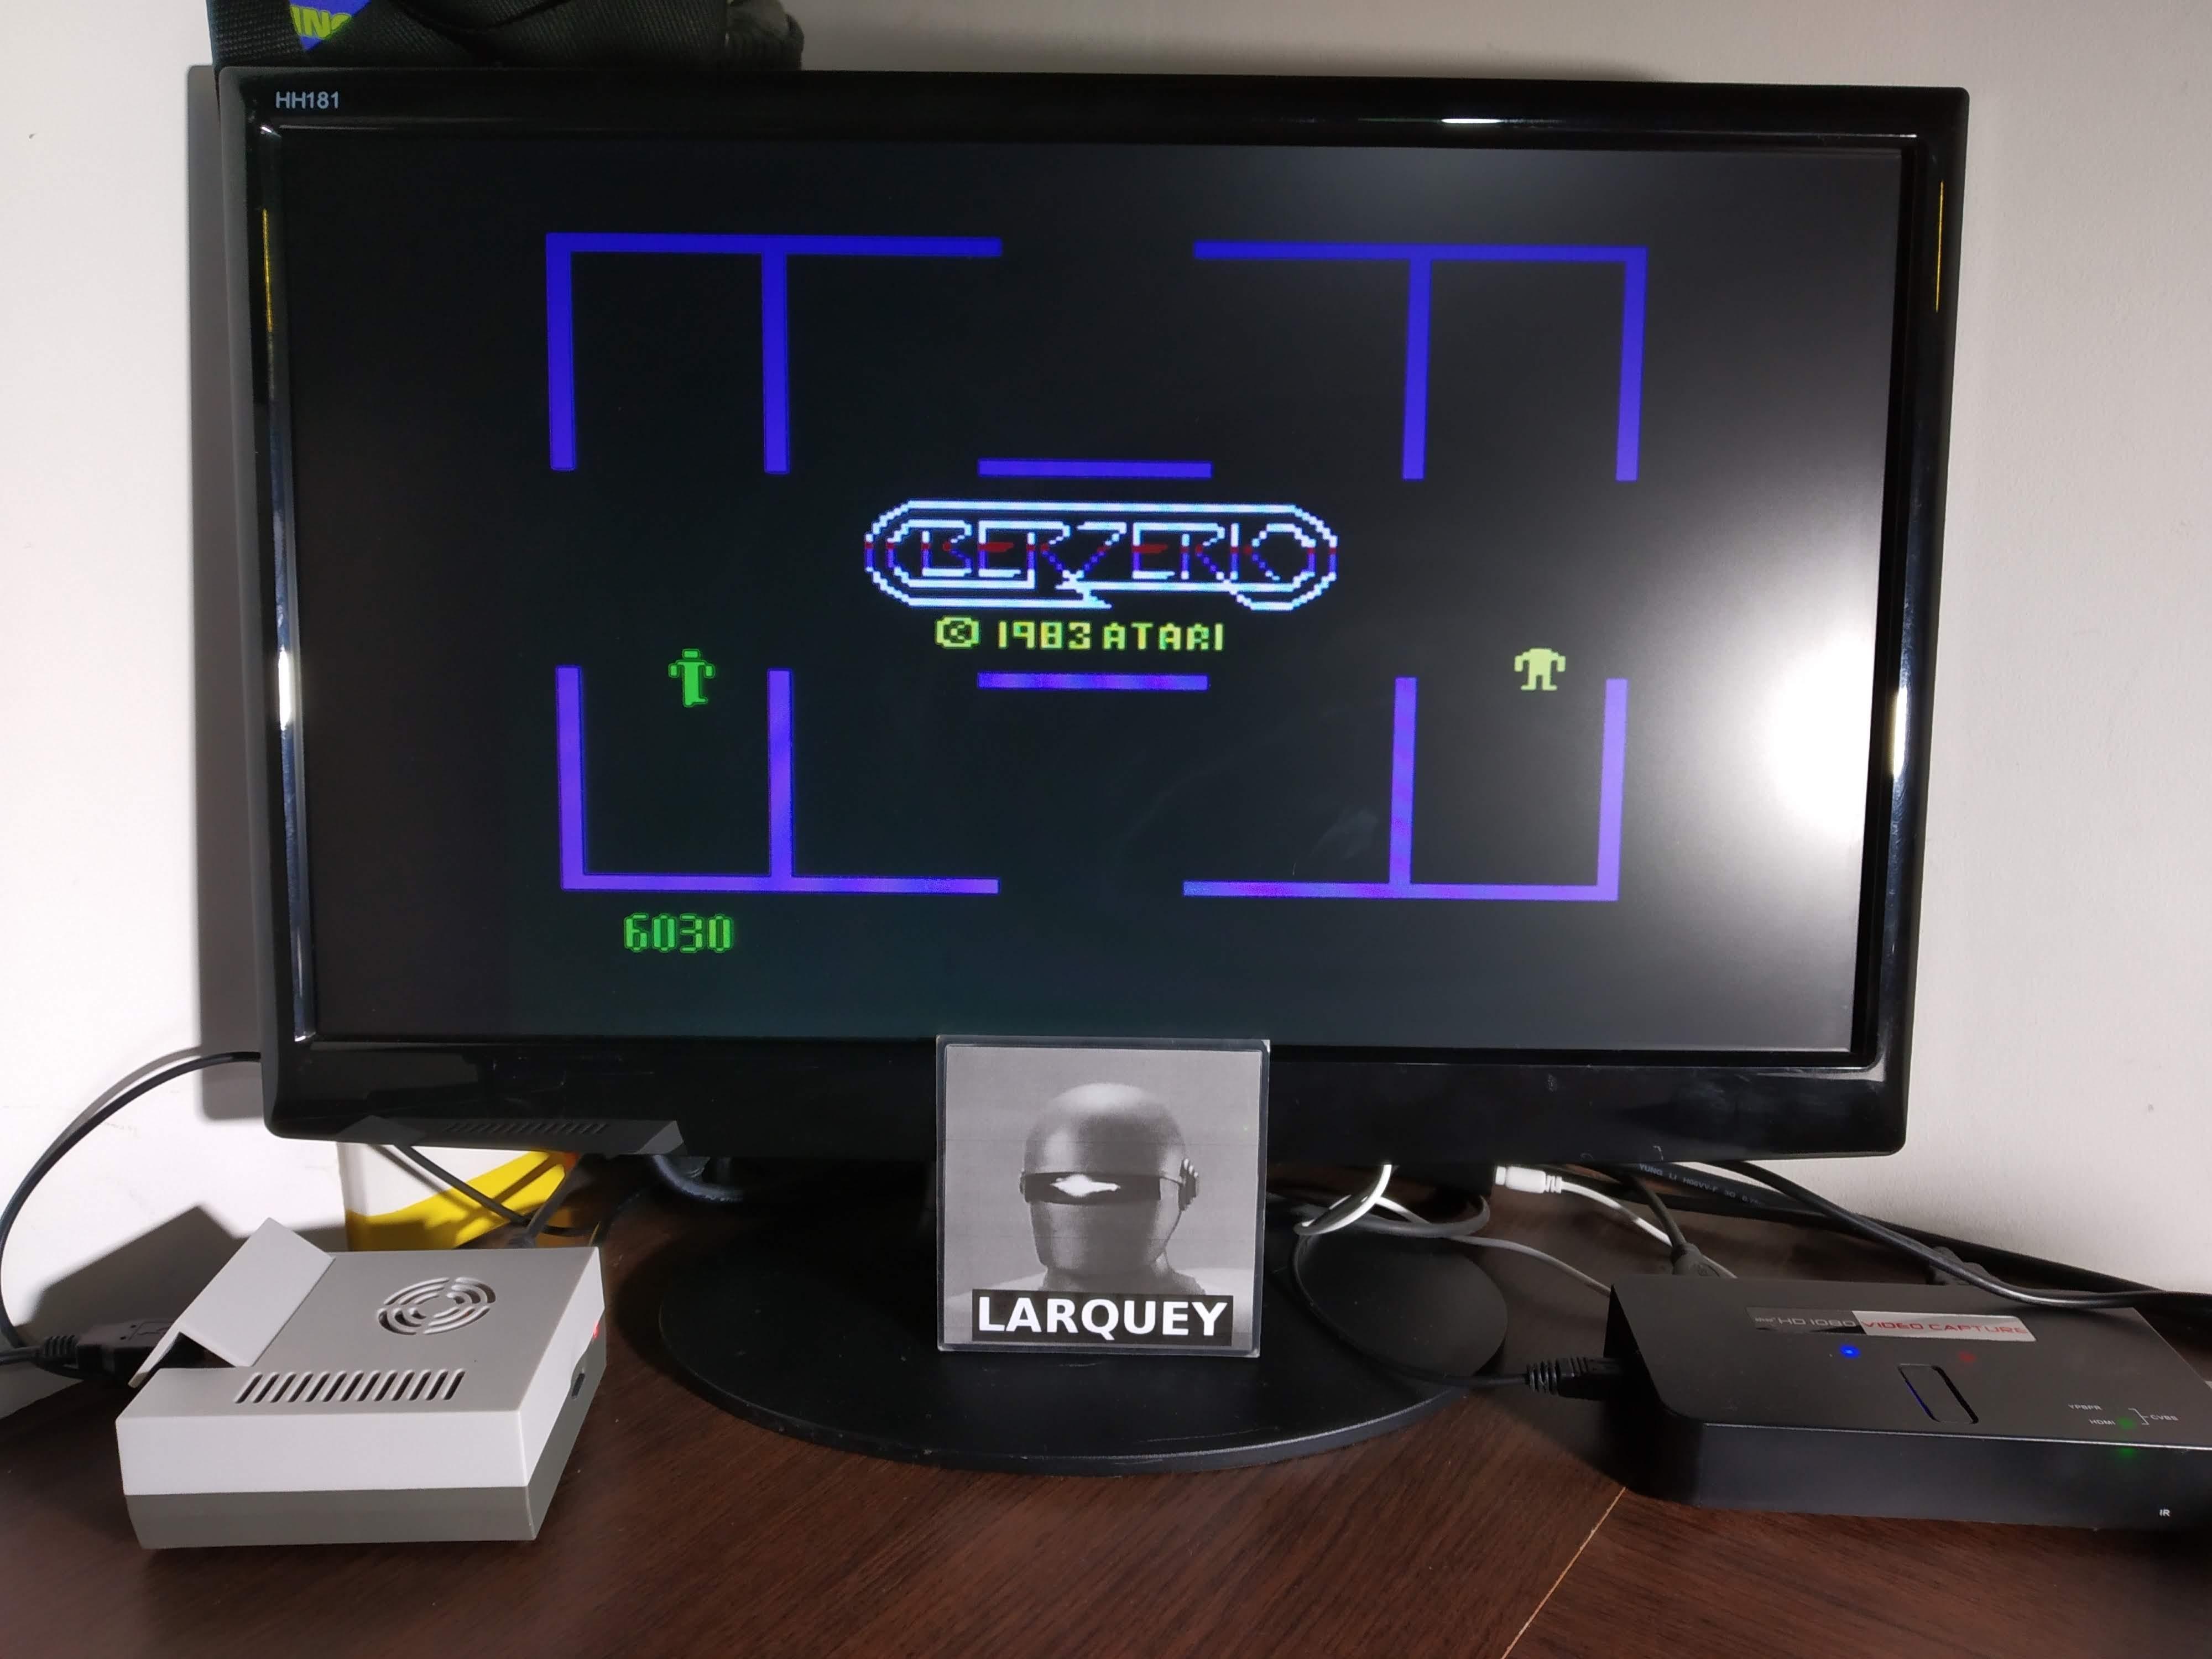 Larquey: Berzerk: Game 1 (Atari 5200 Emulated) 6,030 points on 2019-11-09 03:14:05